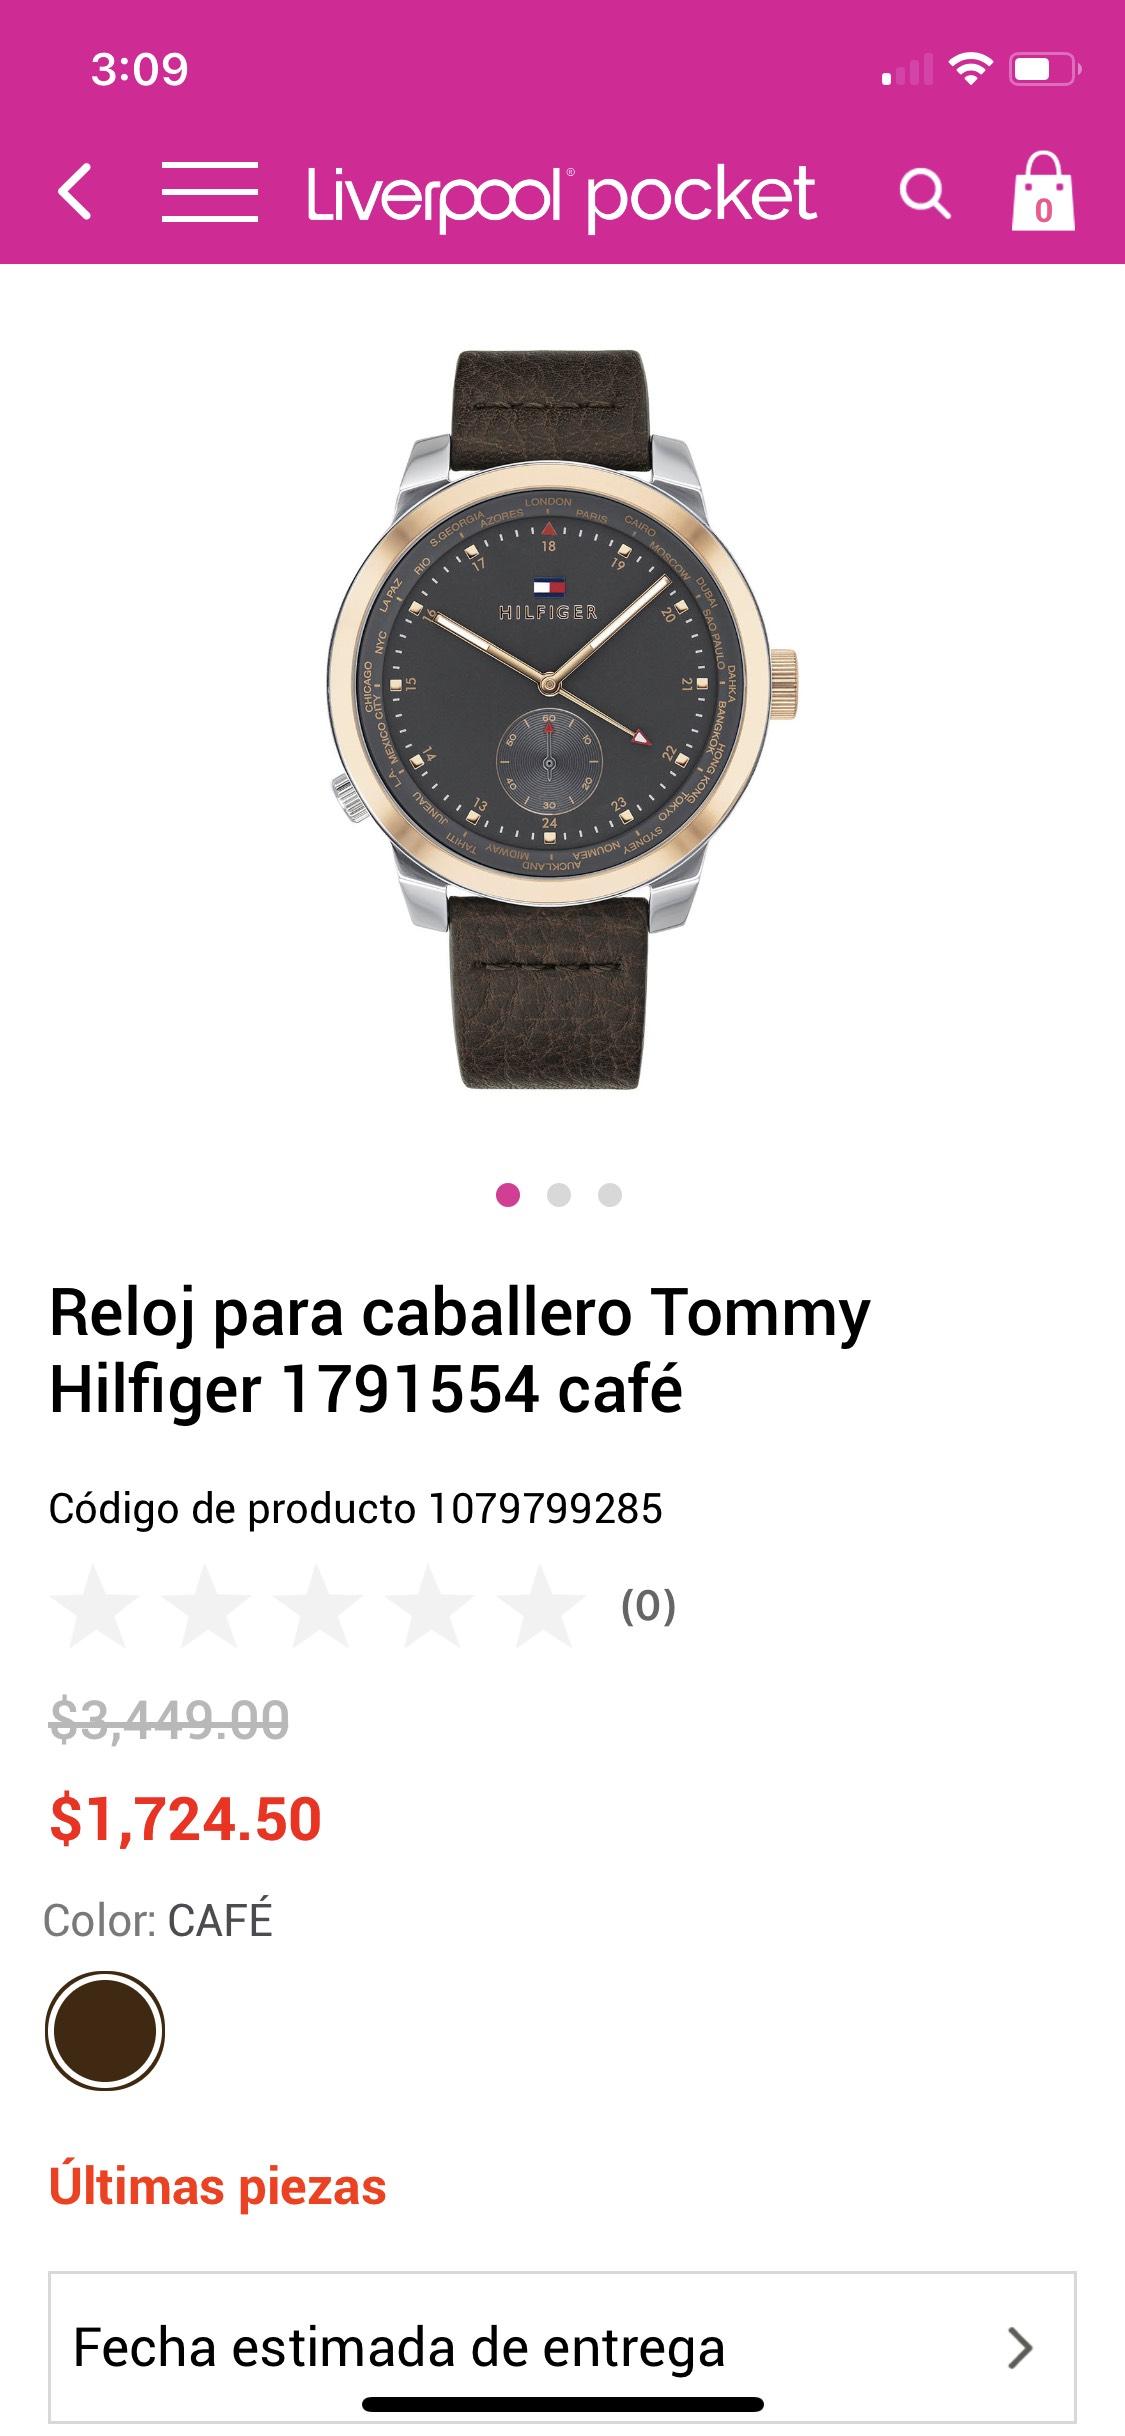 Liverpool: Reloj Tommy Hilfiger (pagando con Tarjeta Liverpool)